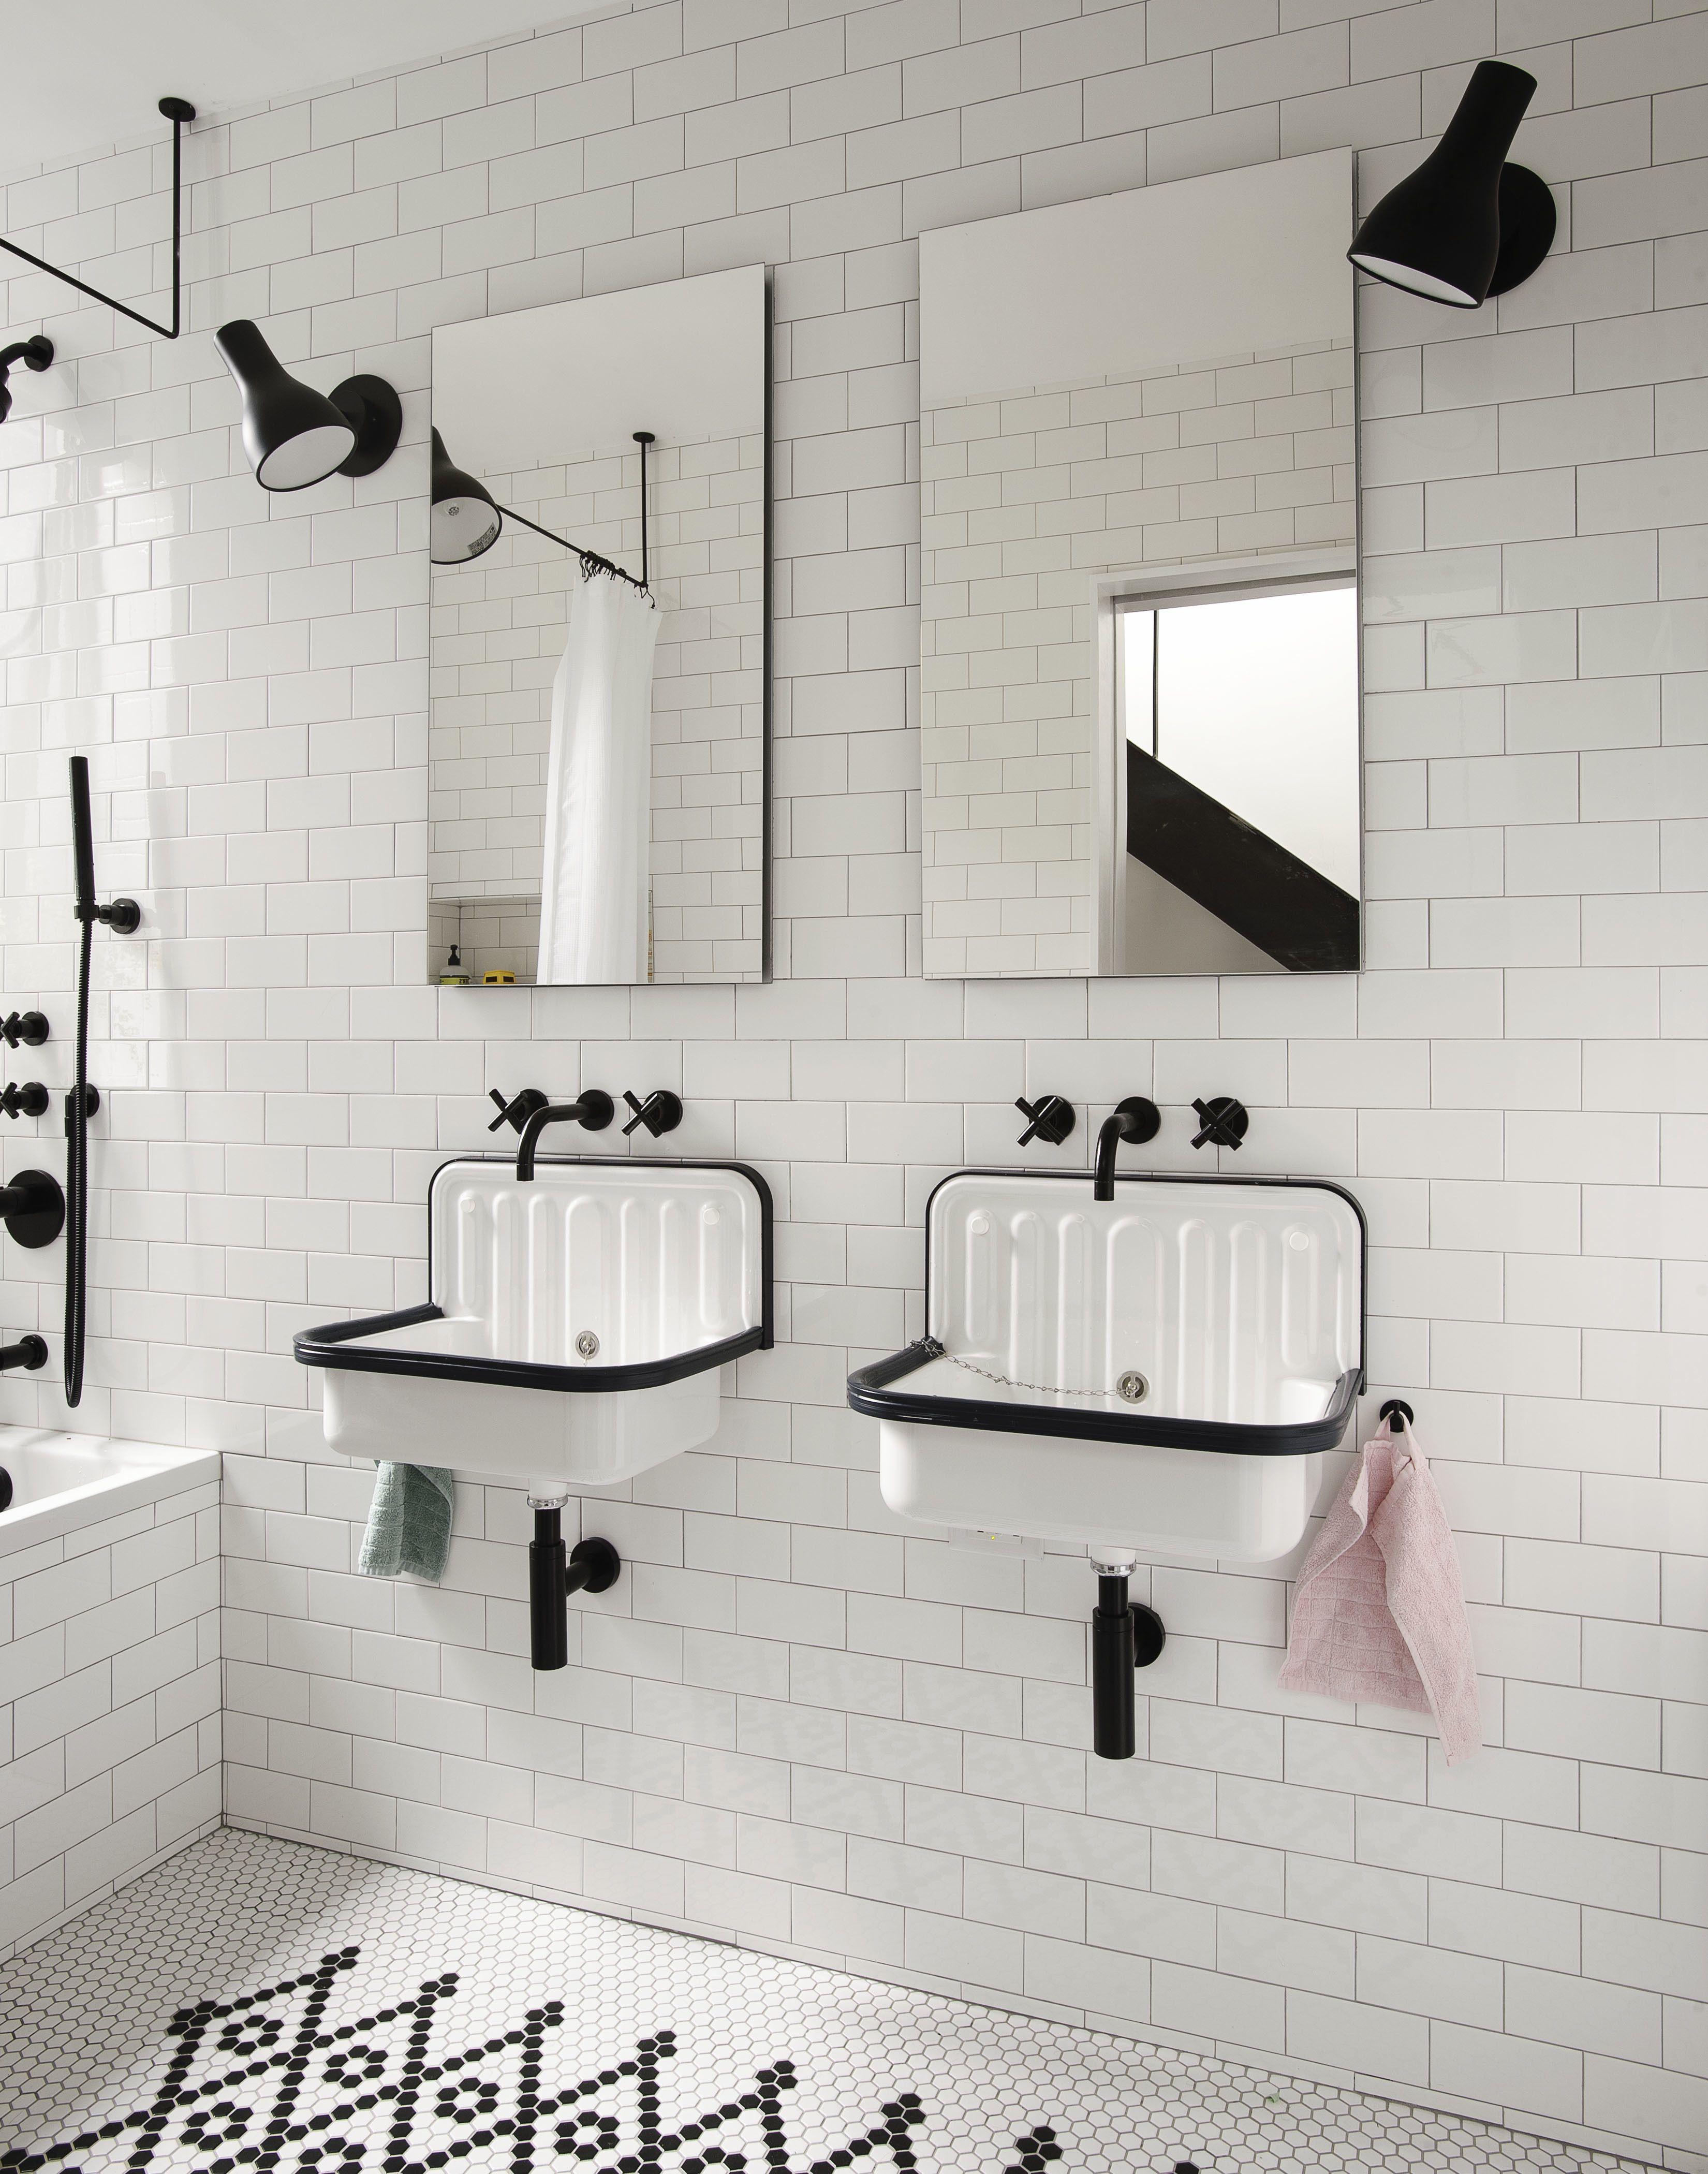 Little House Big City By Office Of Architecture Bathroom Shower Design Bathroom Trends Bathroom Tub Shower